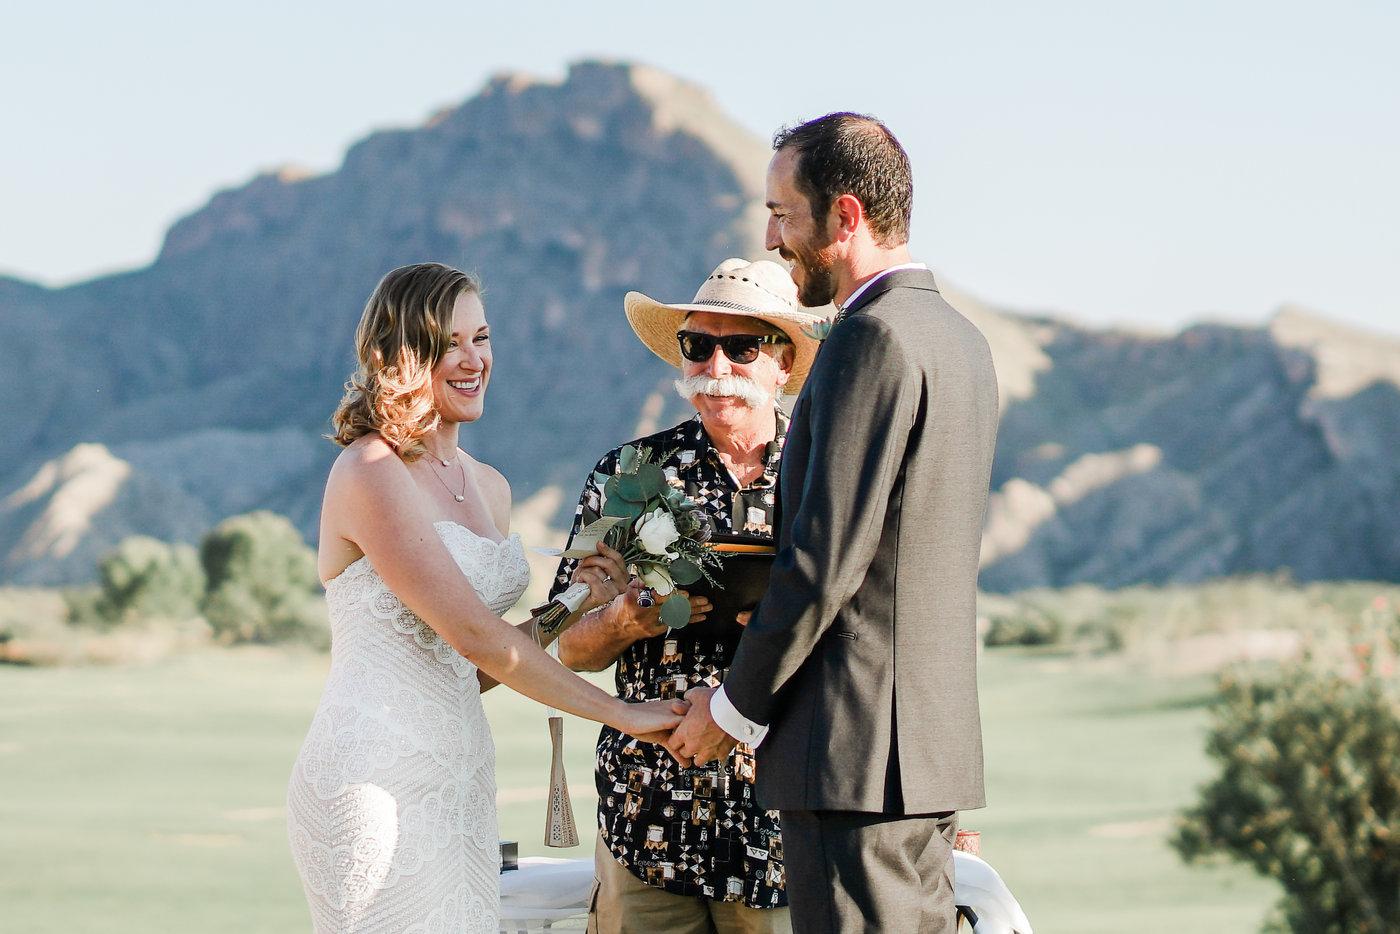 Lajitas Wedding Photos. Lajitas Golf Resort and Spa Wedding near Big Bend National Park.